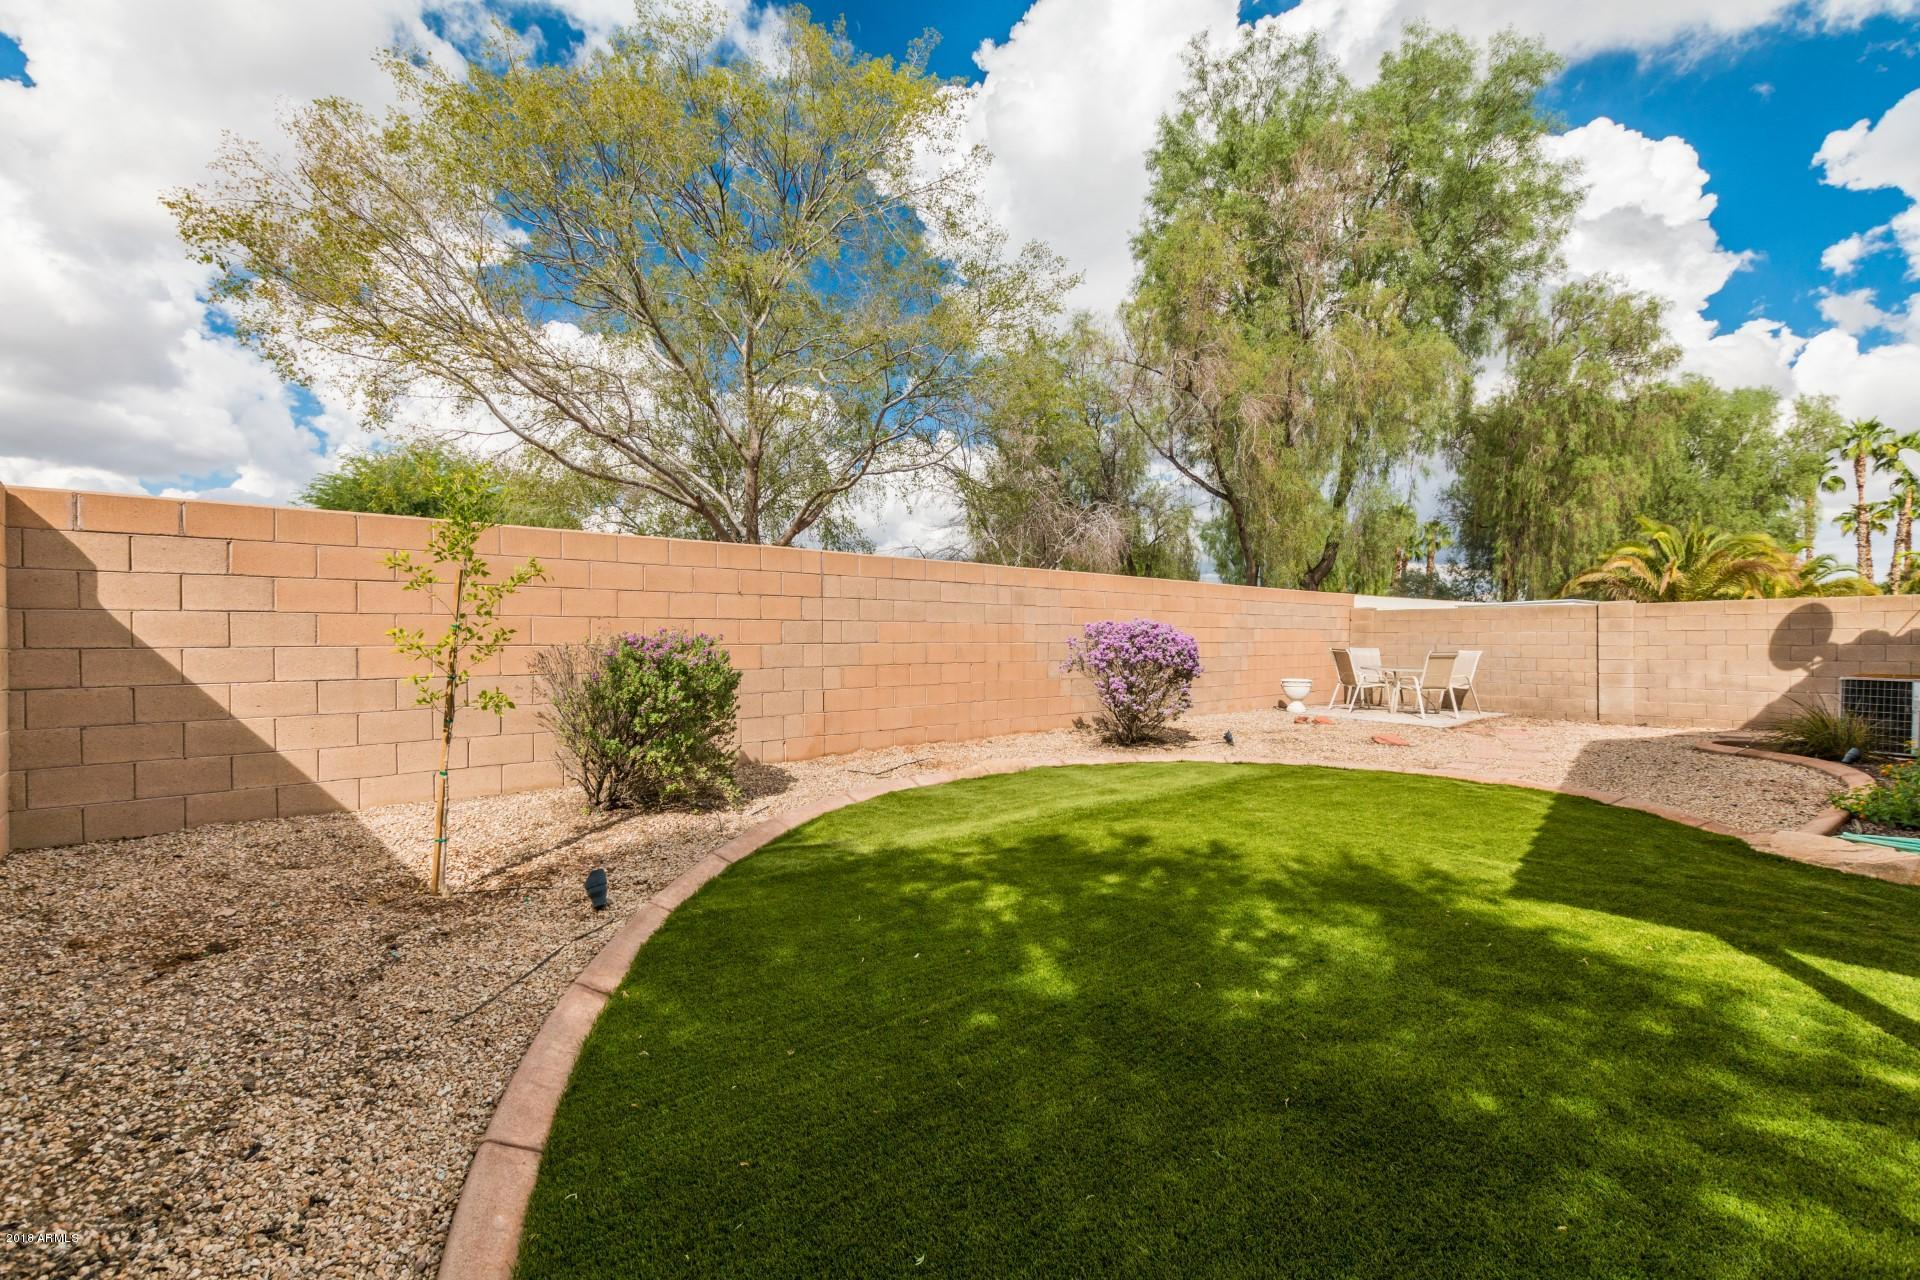 MLS 5828860 538 E DEVON Drive, Gilbert, AZ 85296 Gilbert AZ Neely Farms